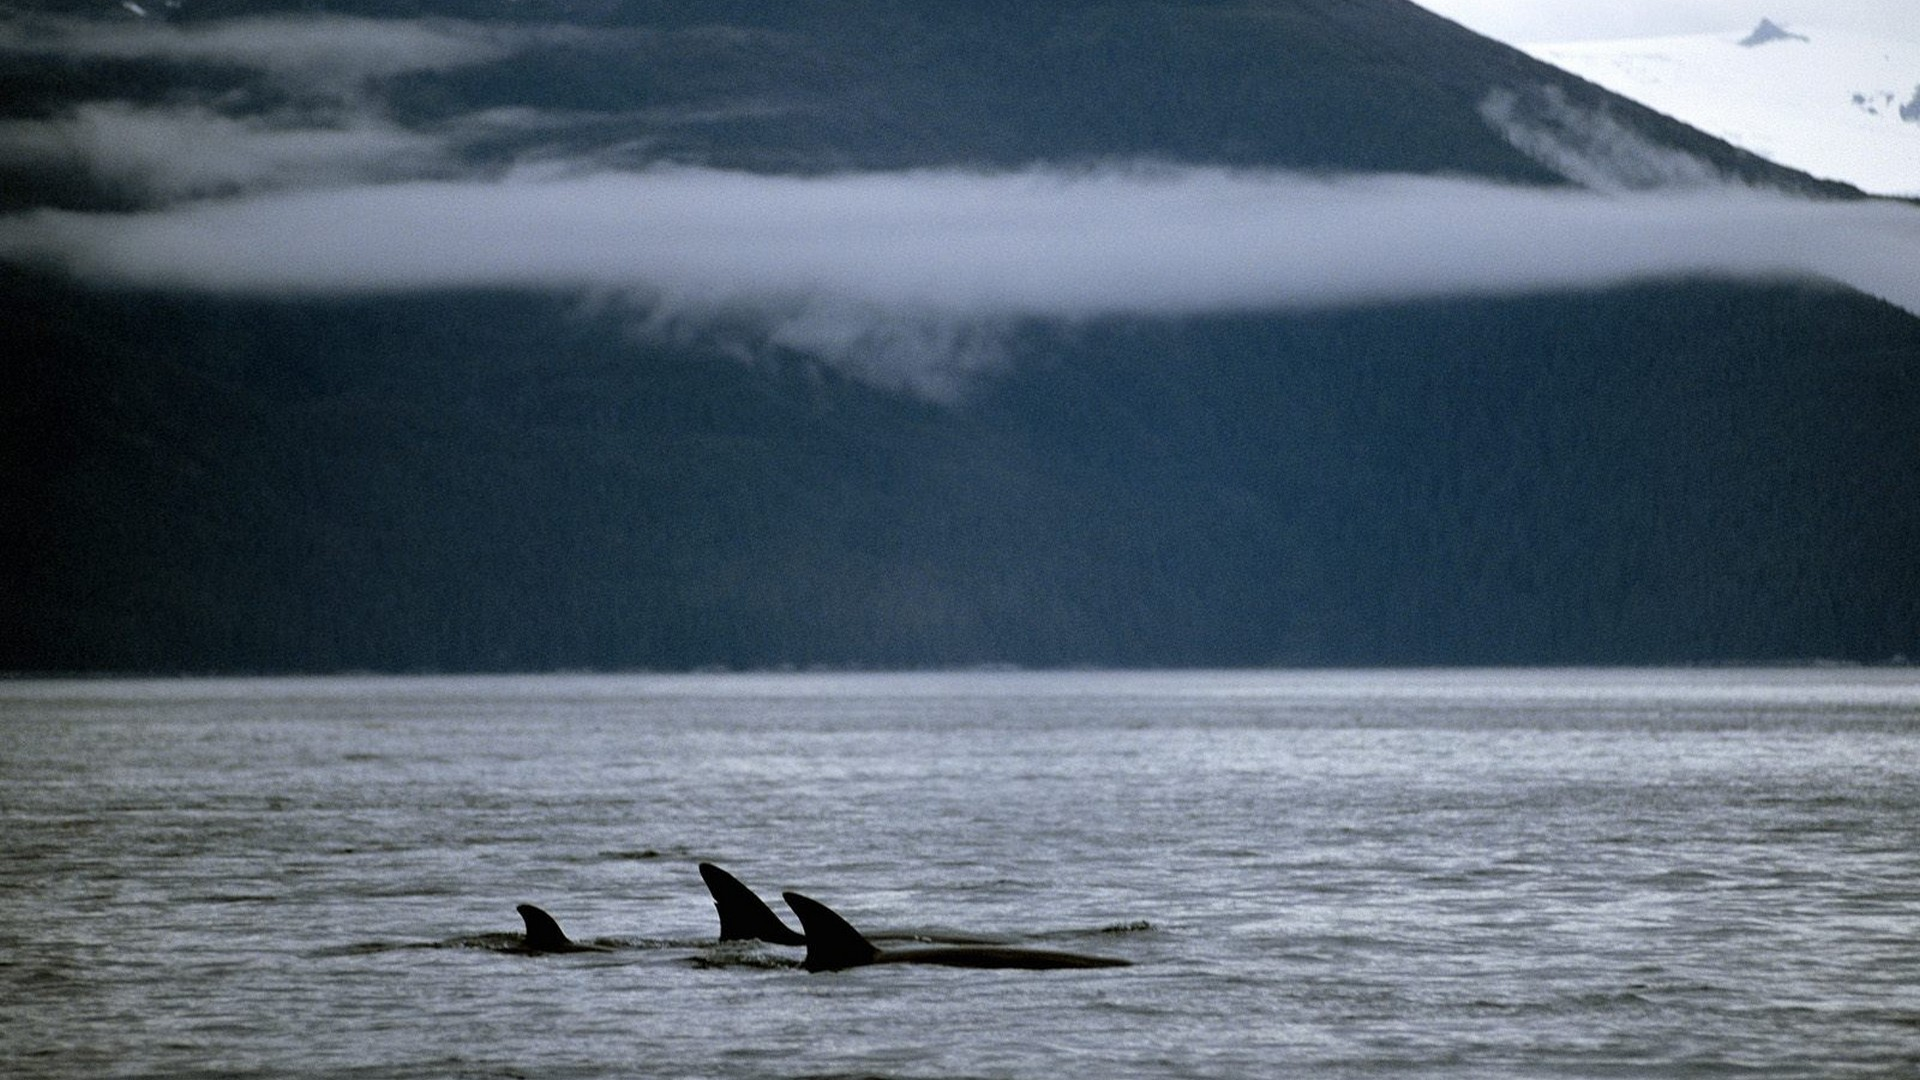 Hd Orca Wallpaper Killer Whale Wallpaper 183 ① Wallpapertag